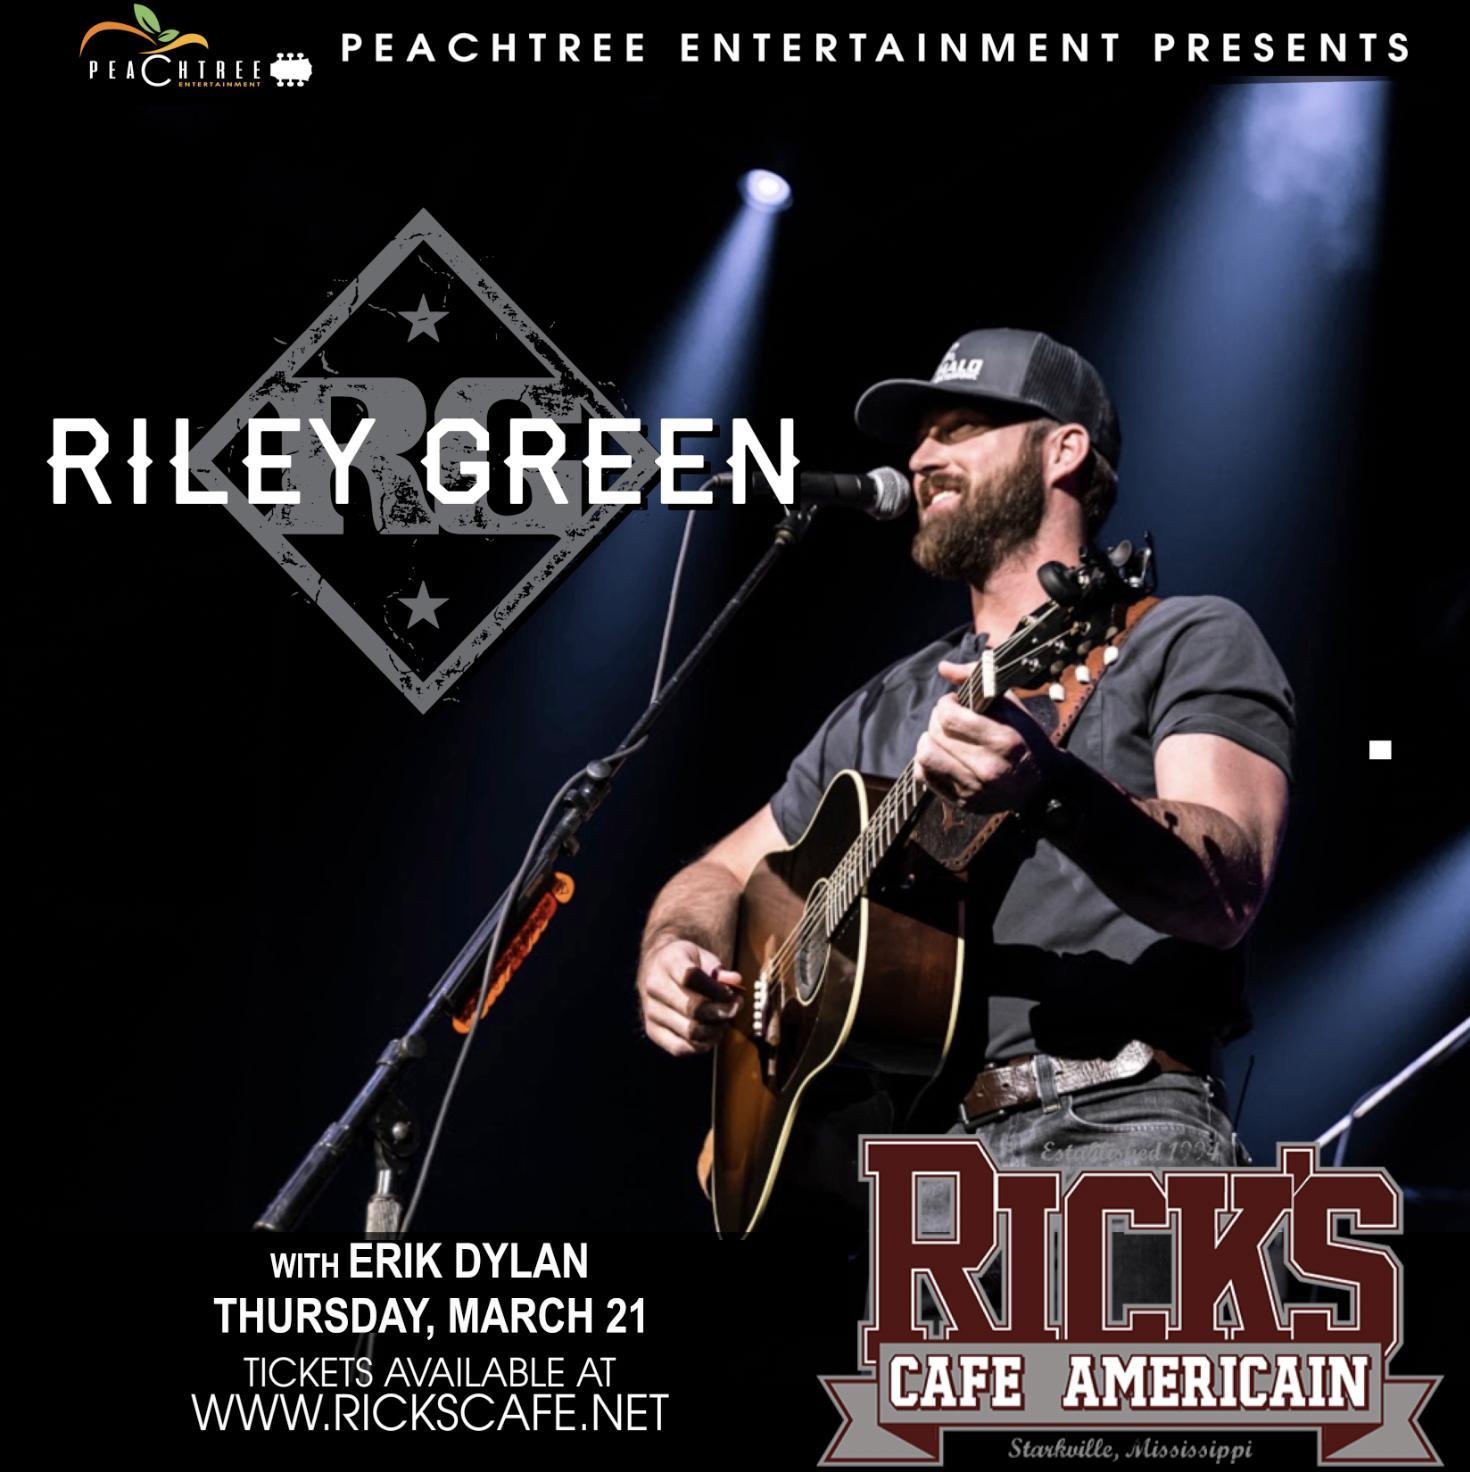 Riley Green @ peachtreeent